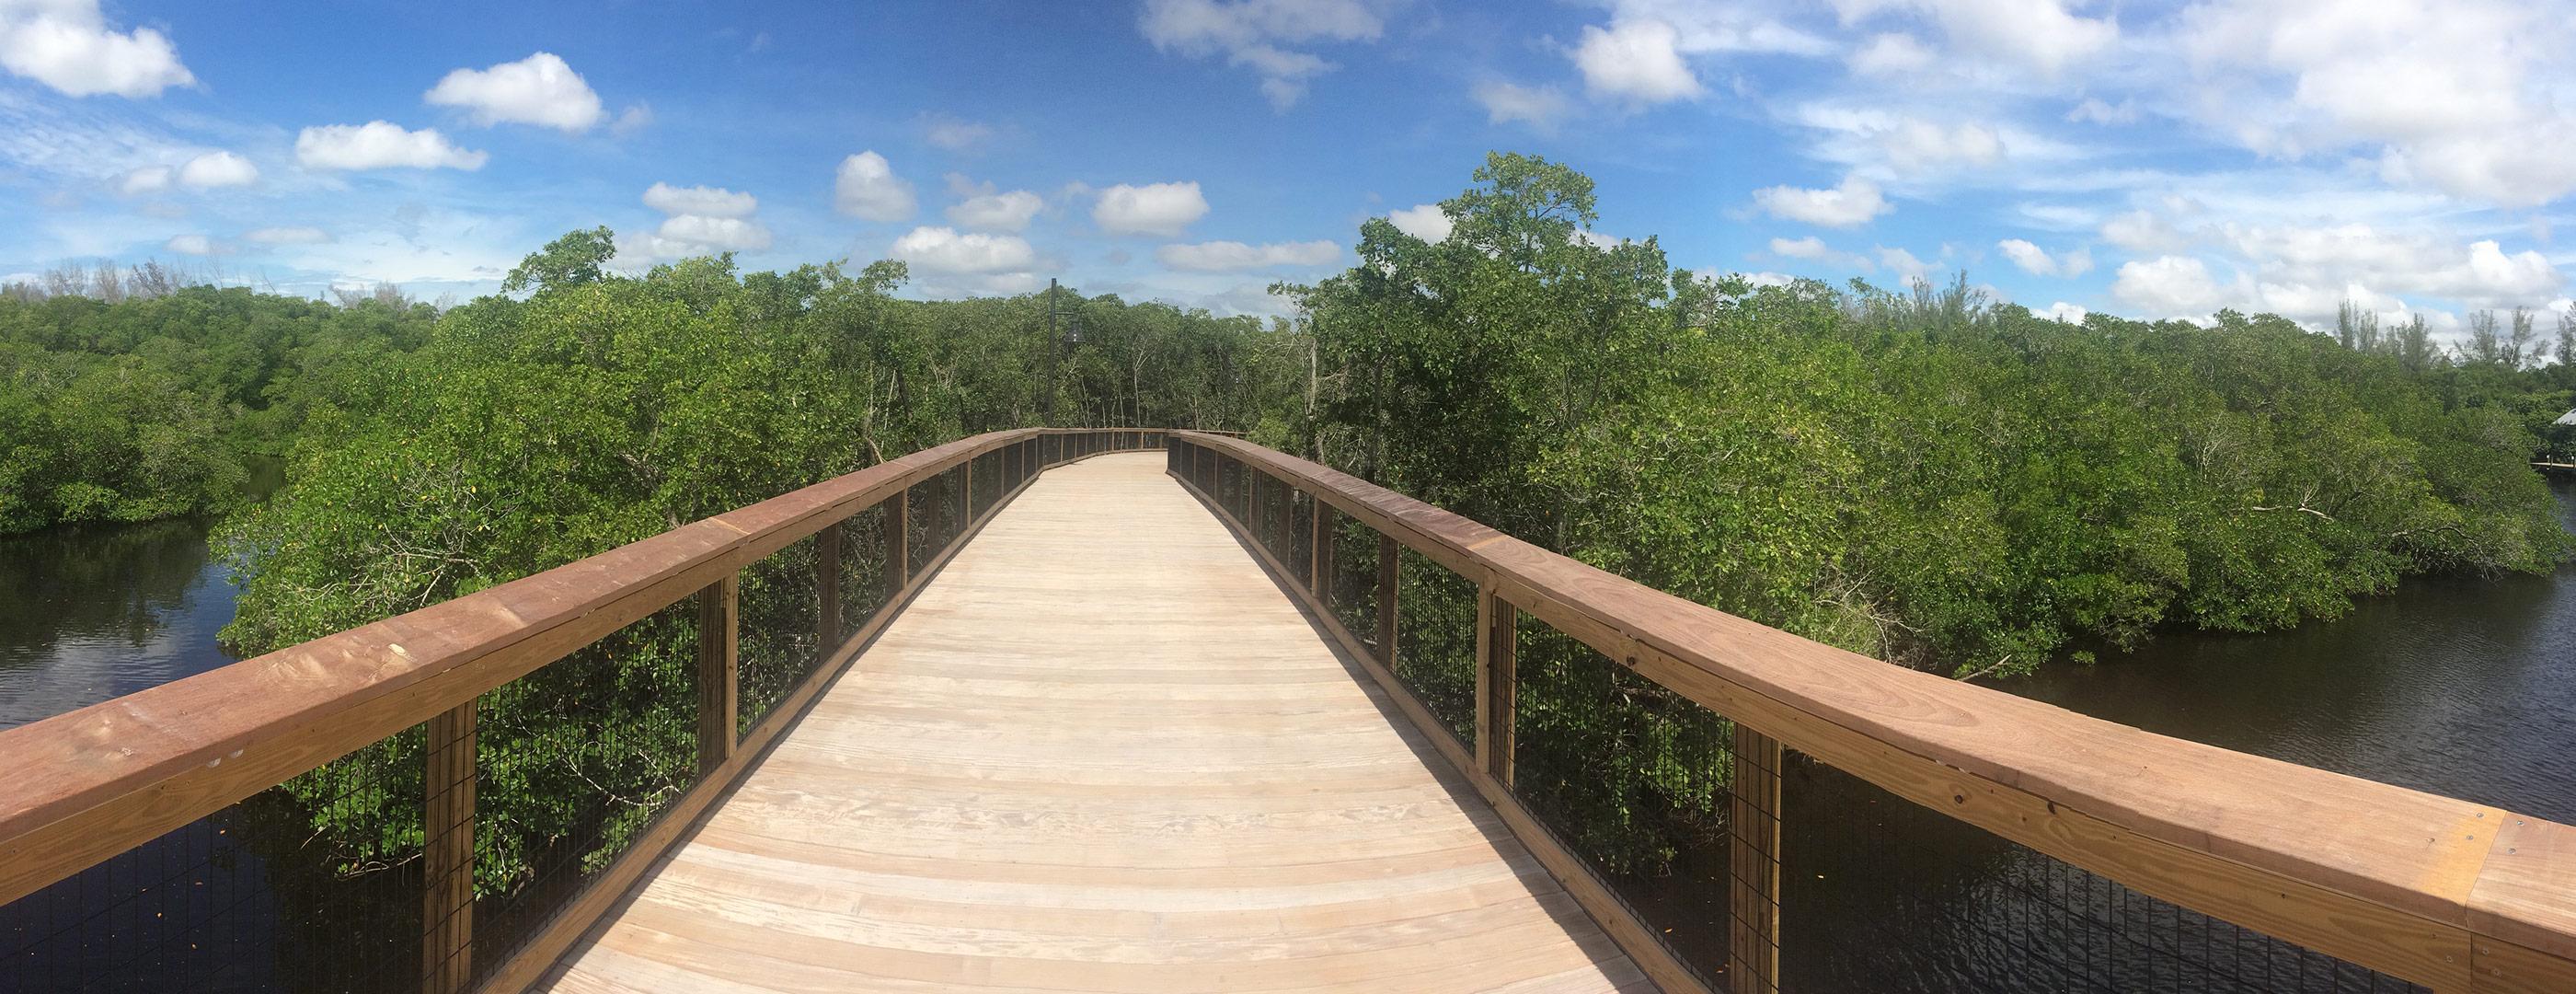 Board walk through preserve